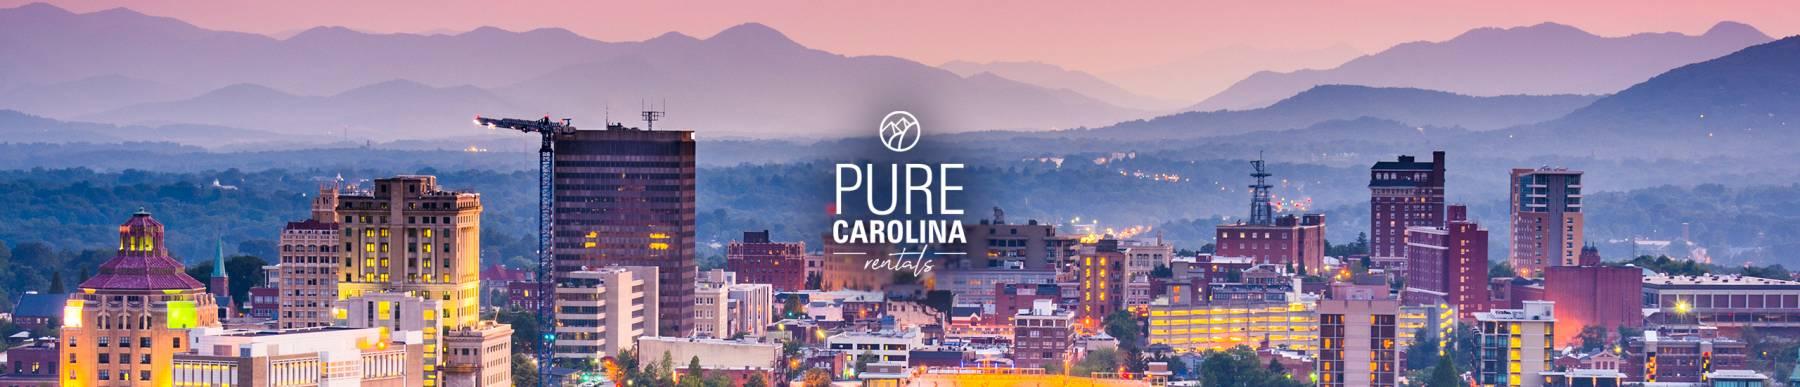 pure carolina Asheville vacation rentals